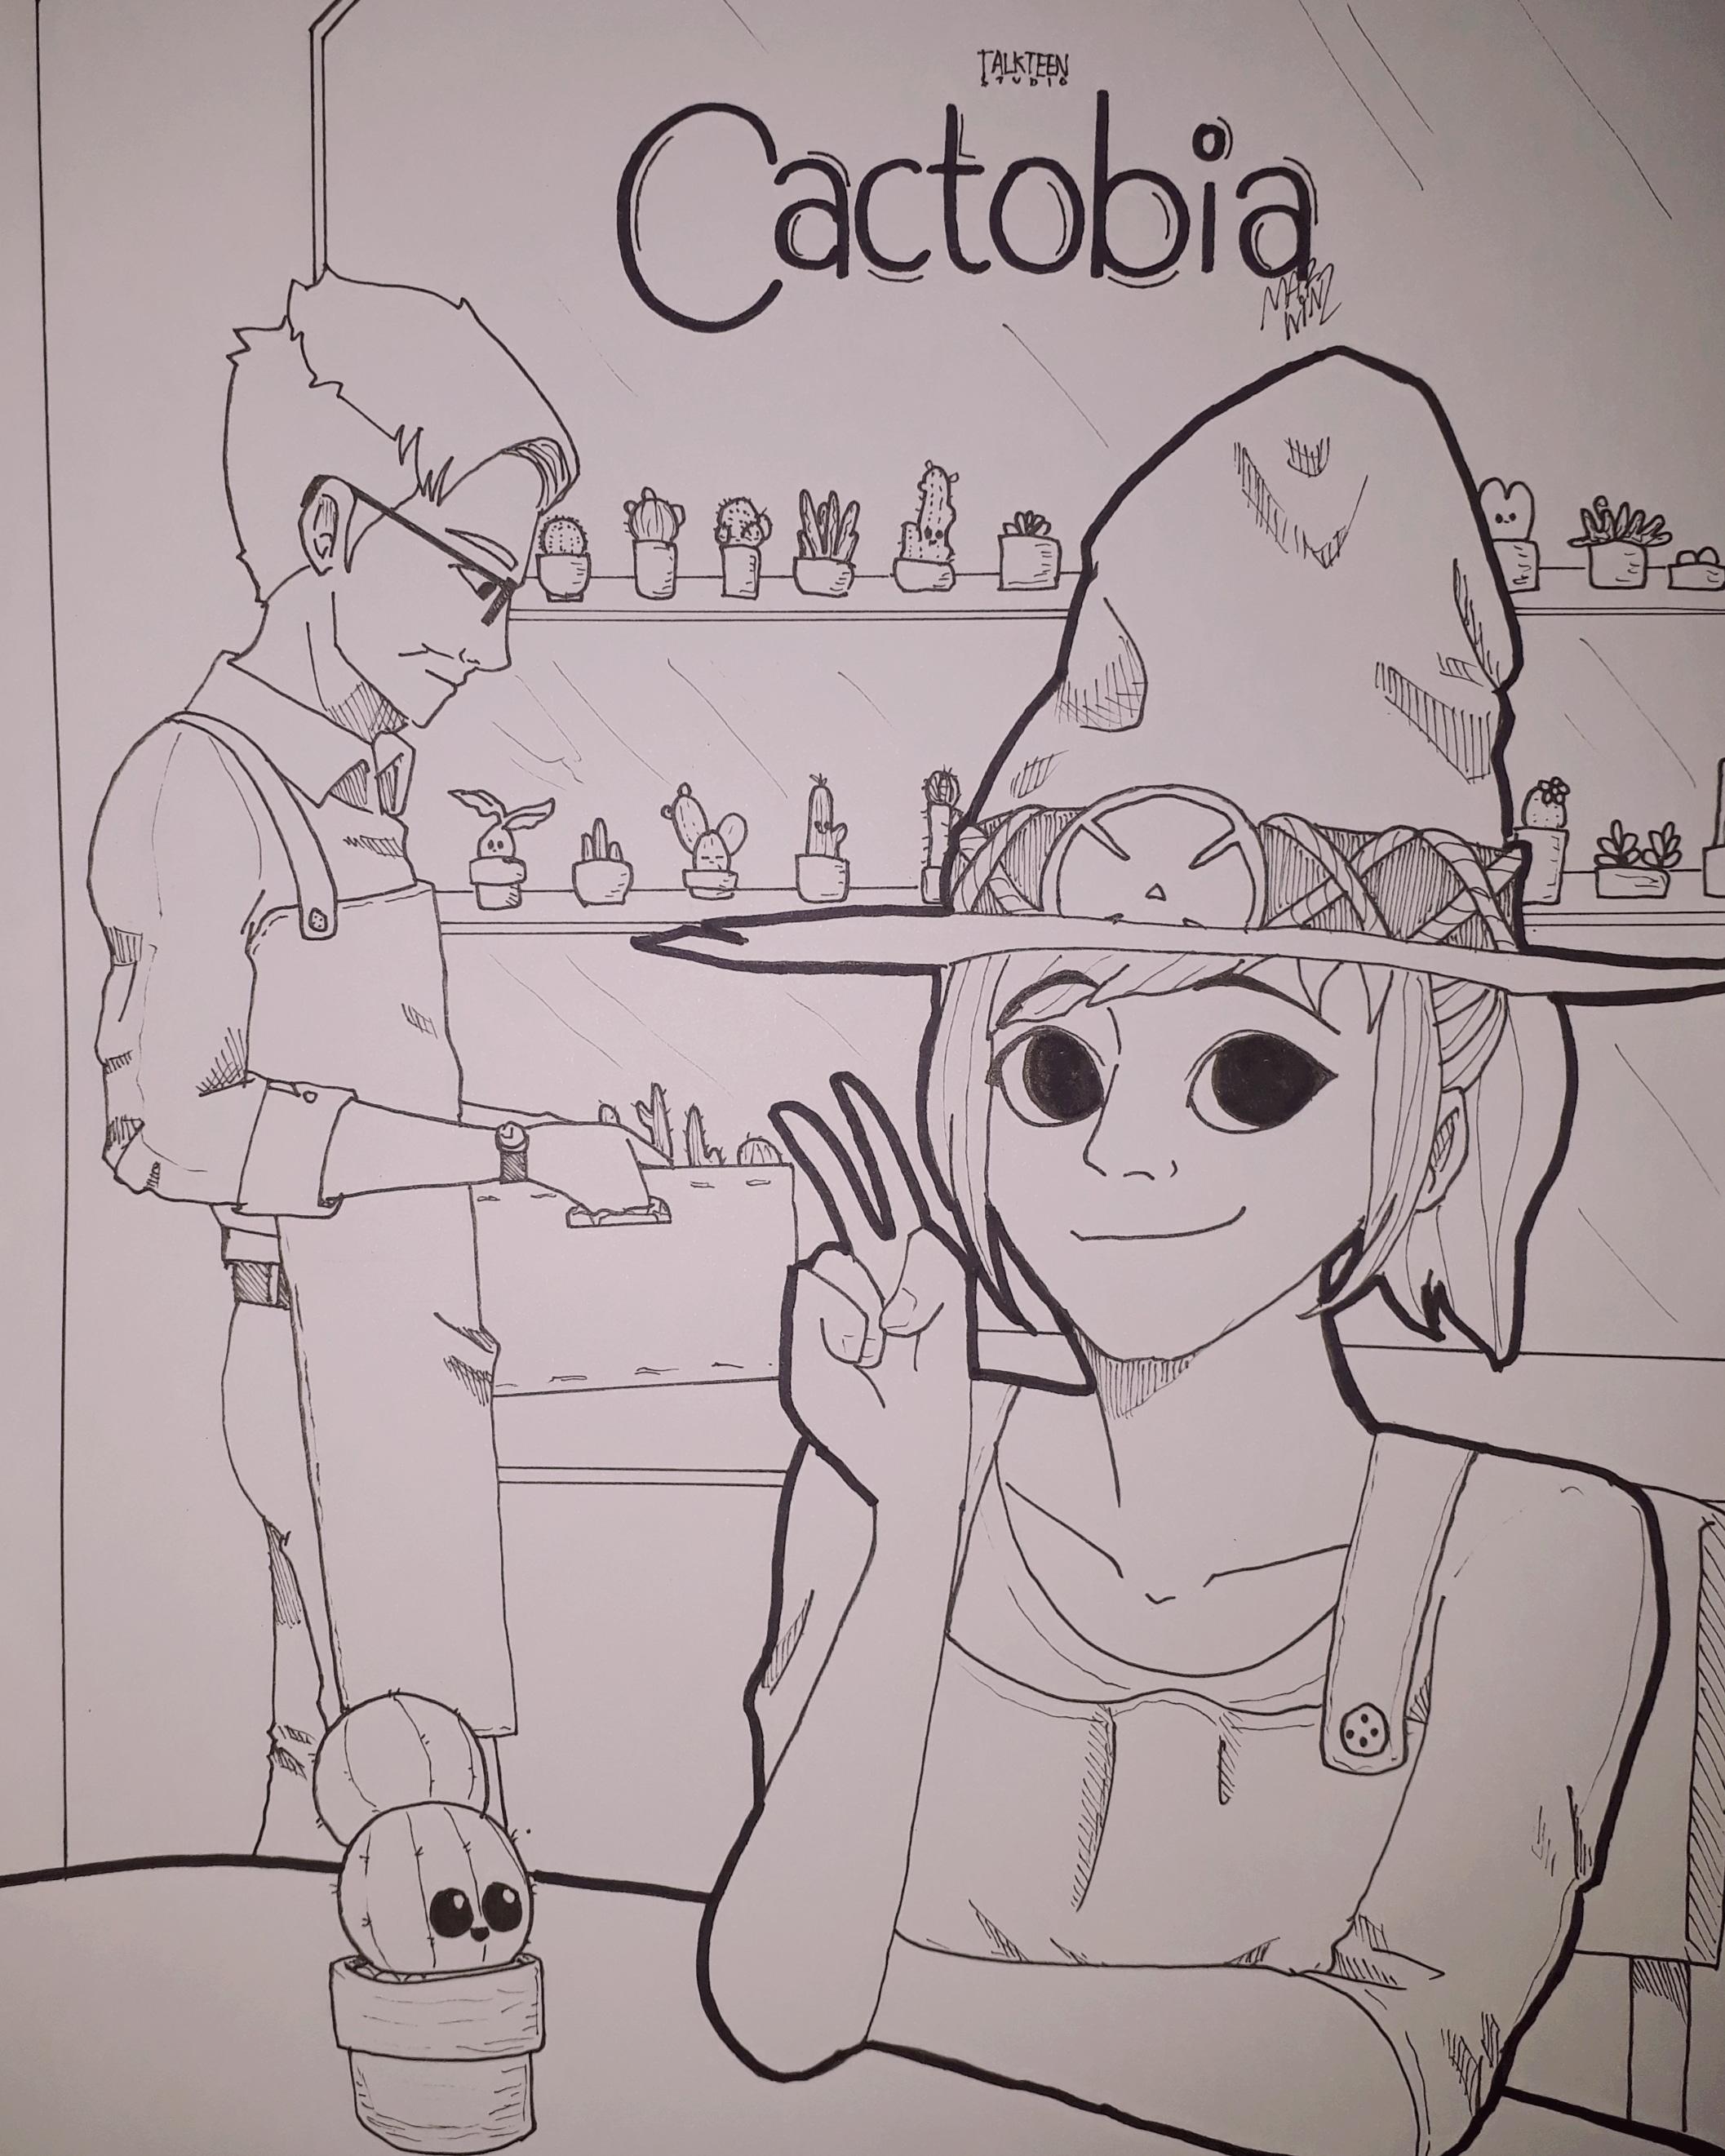 Cactobia ผู้วิเศษแห่งพฤกษา